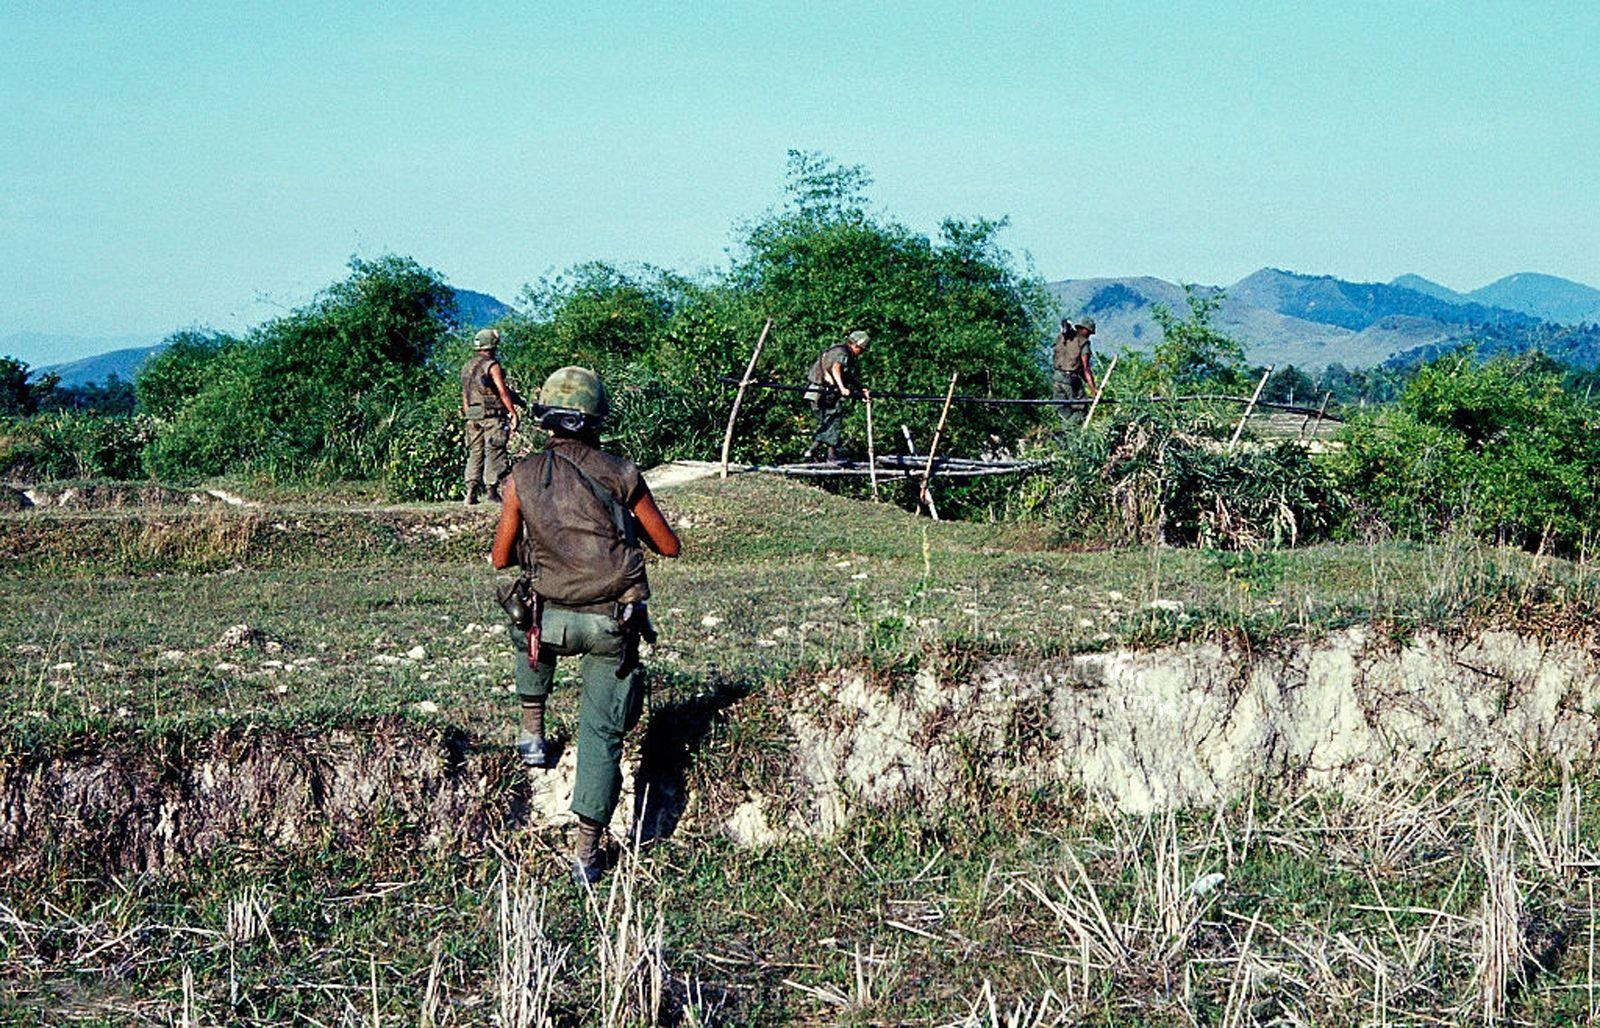 Vietnam War 1968 U S Infantry Soldiers On Patrol In I Corps Quang Ngai Province Vietnam War Vietnam War Photos Vietnam